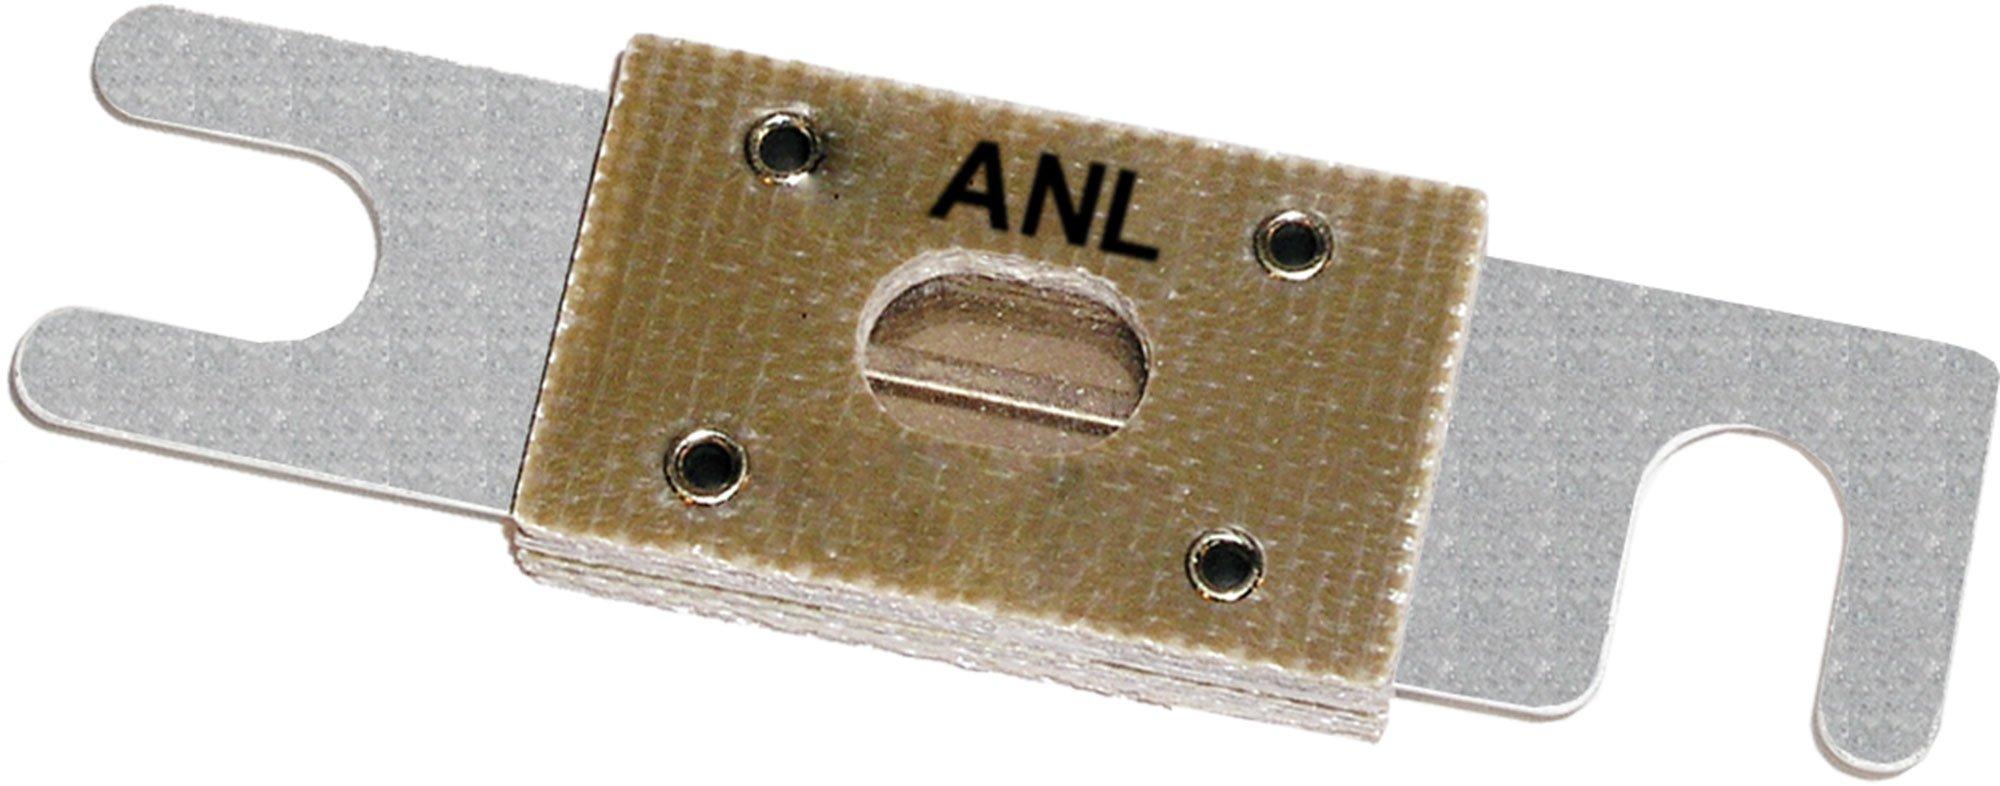 Blue Sea Systems ANL 35 AMP Fuse